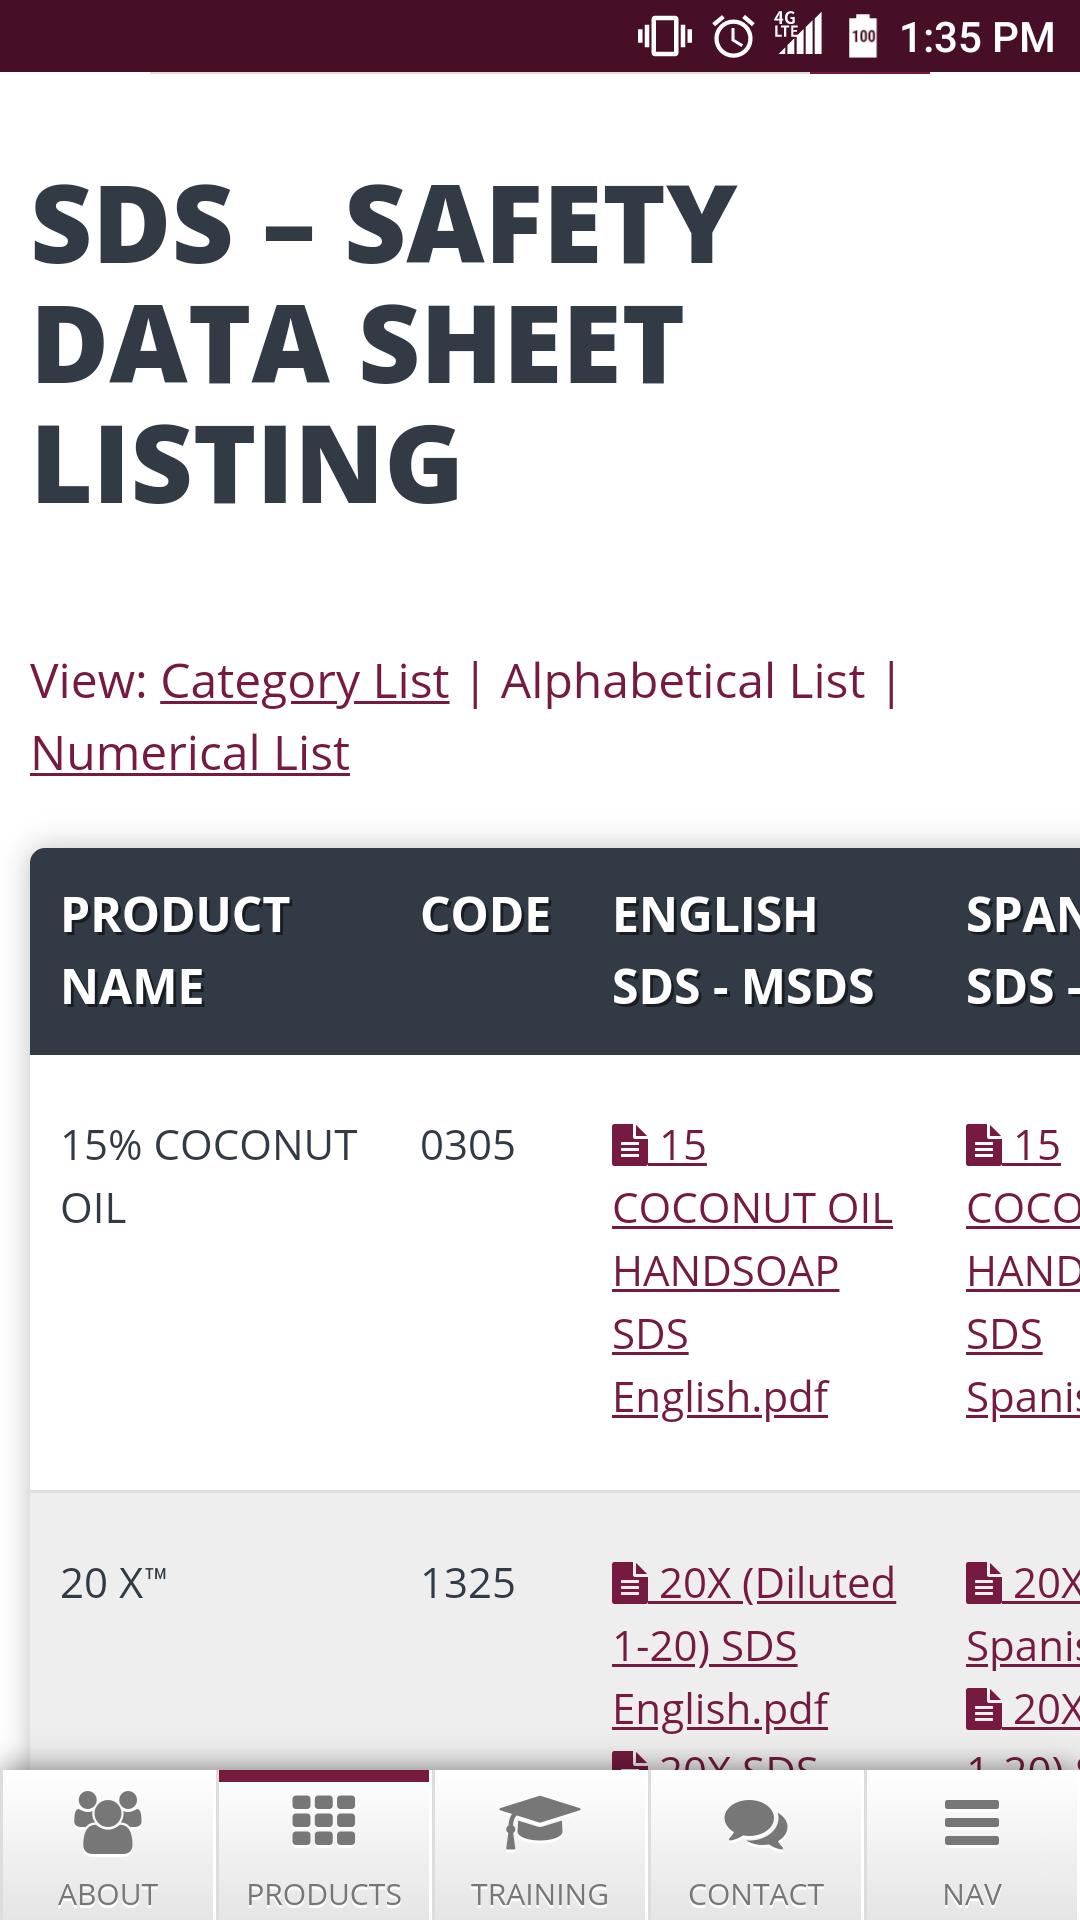 Safety Data Sheet listing